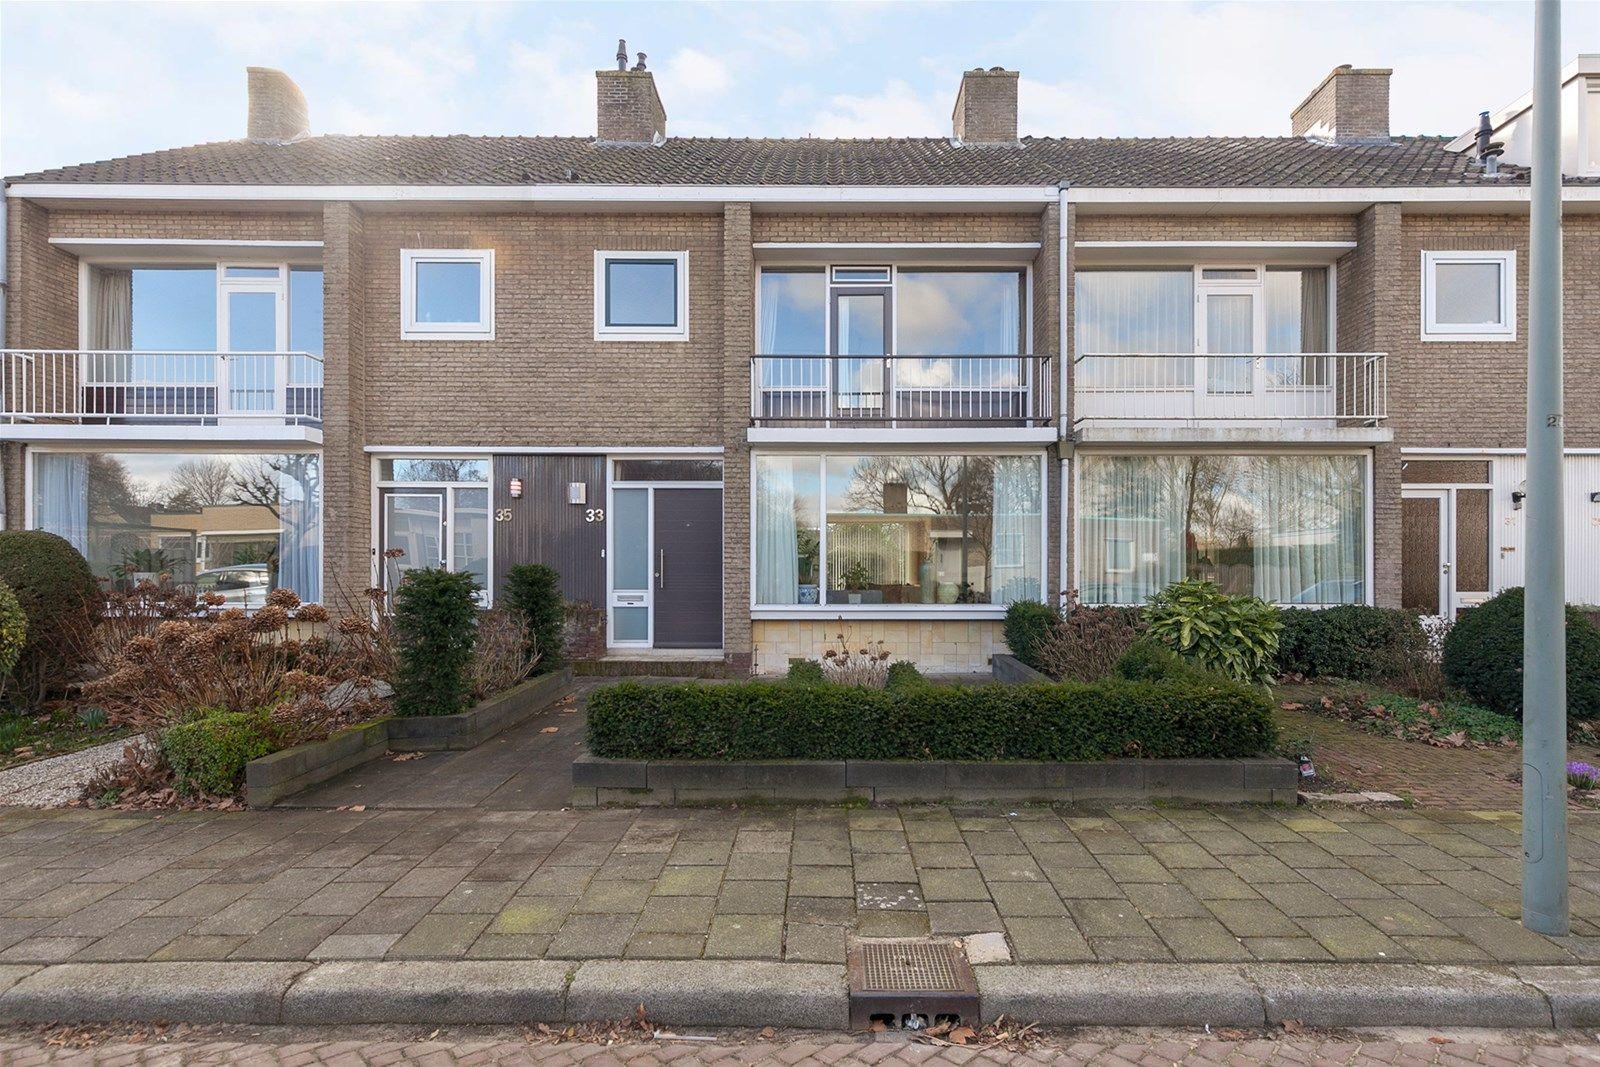 Campanula 33, Dordrecht